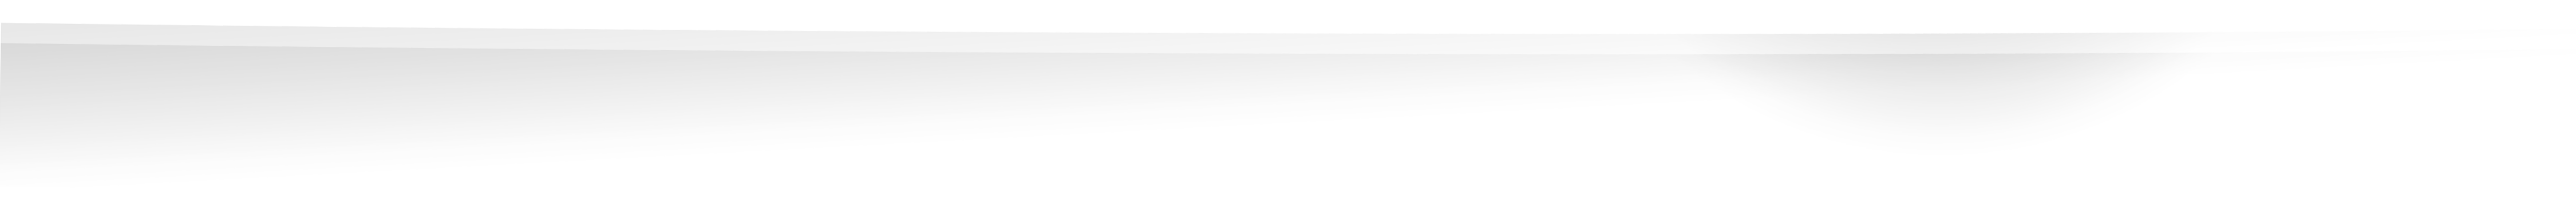 Schatten_025